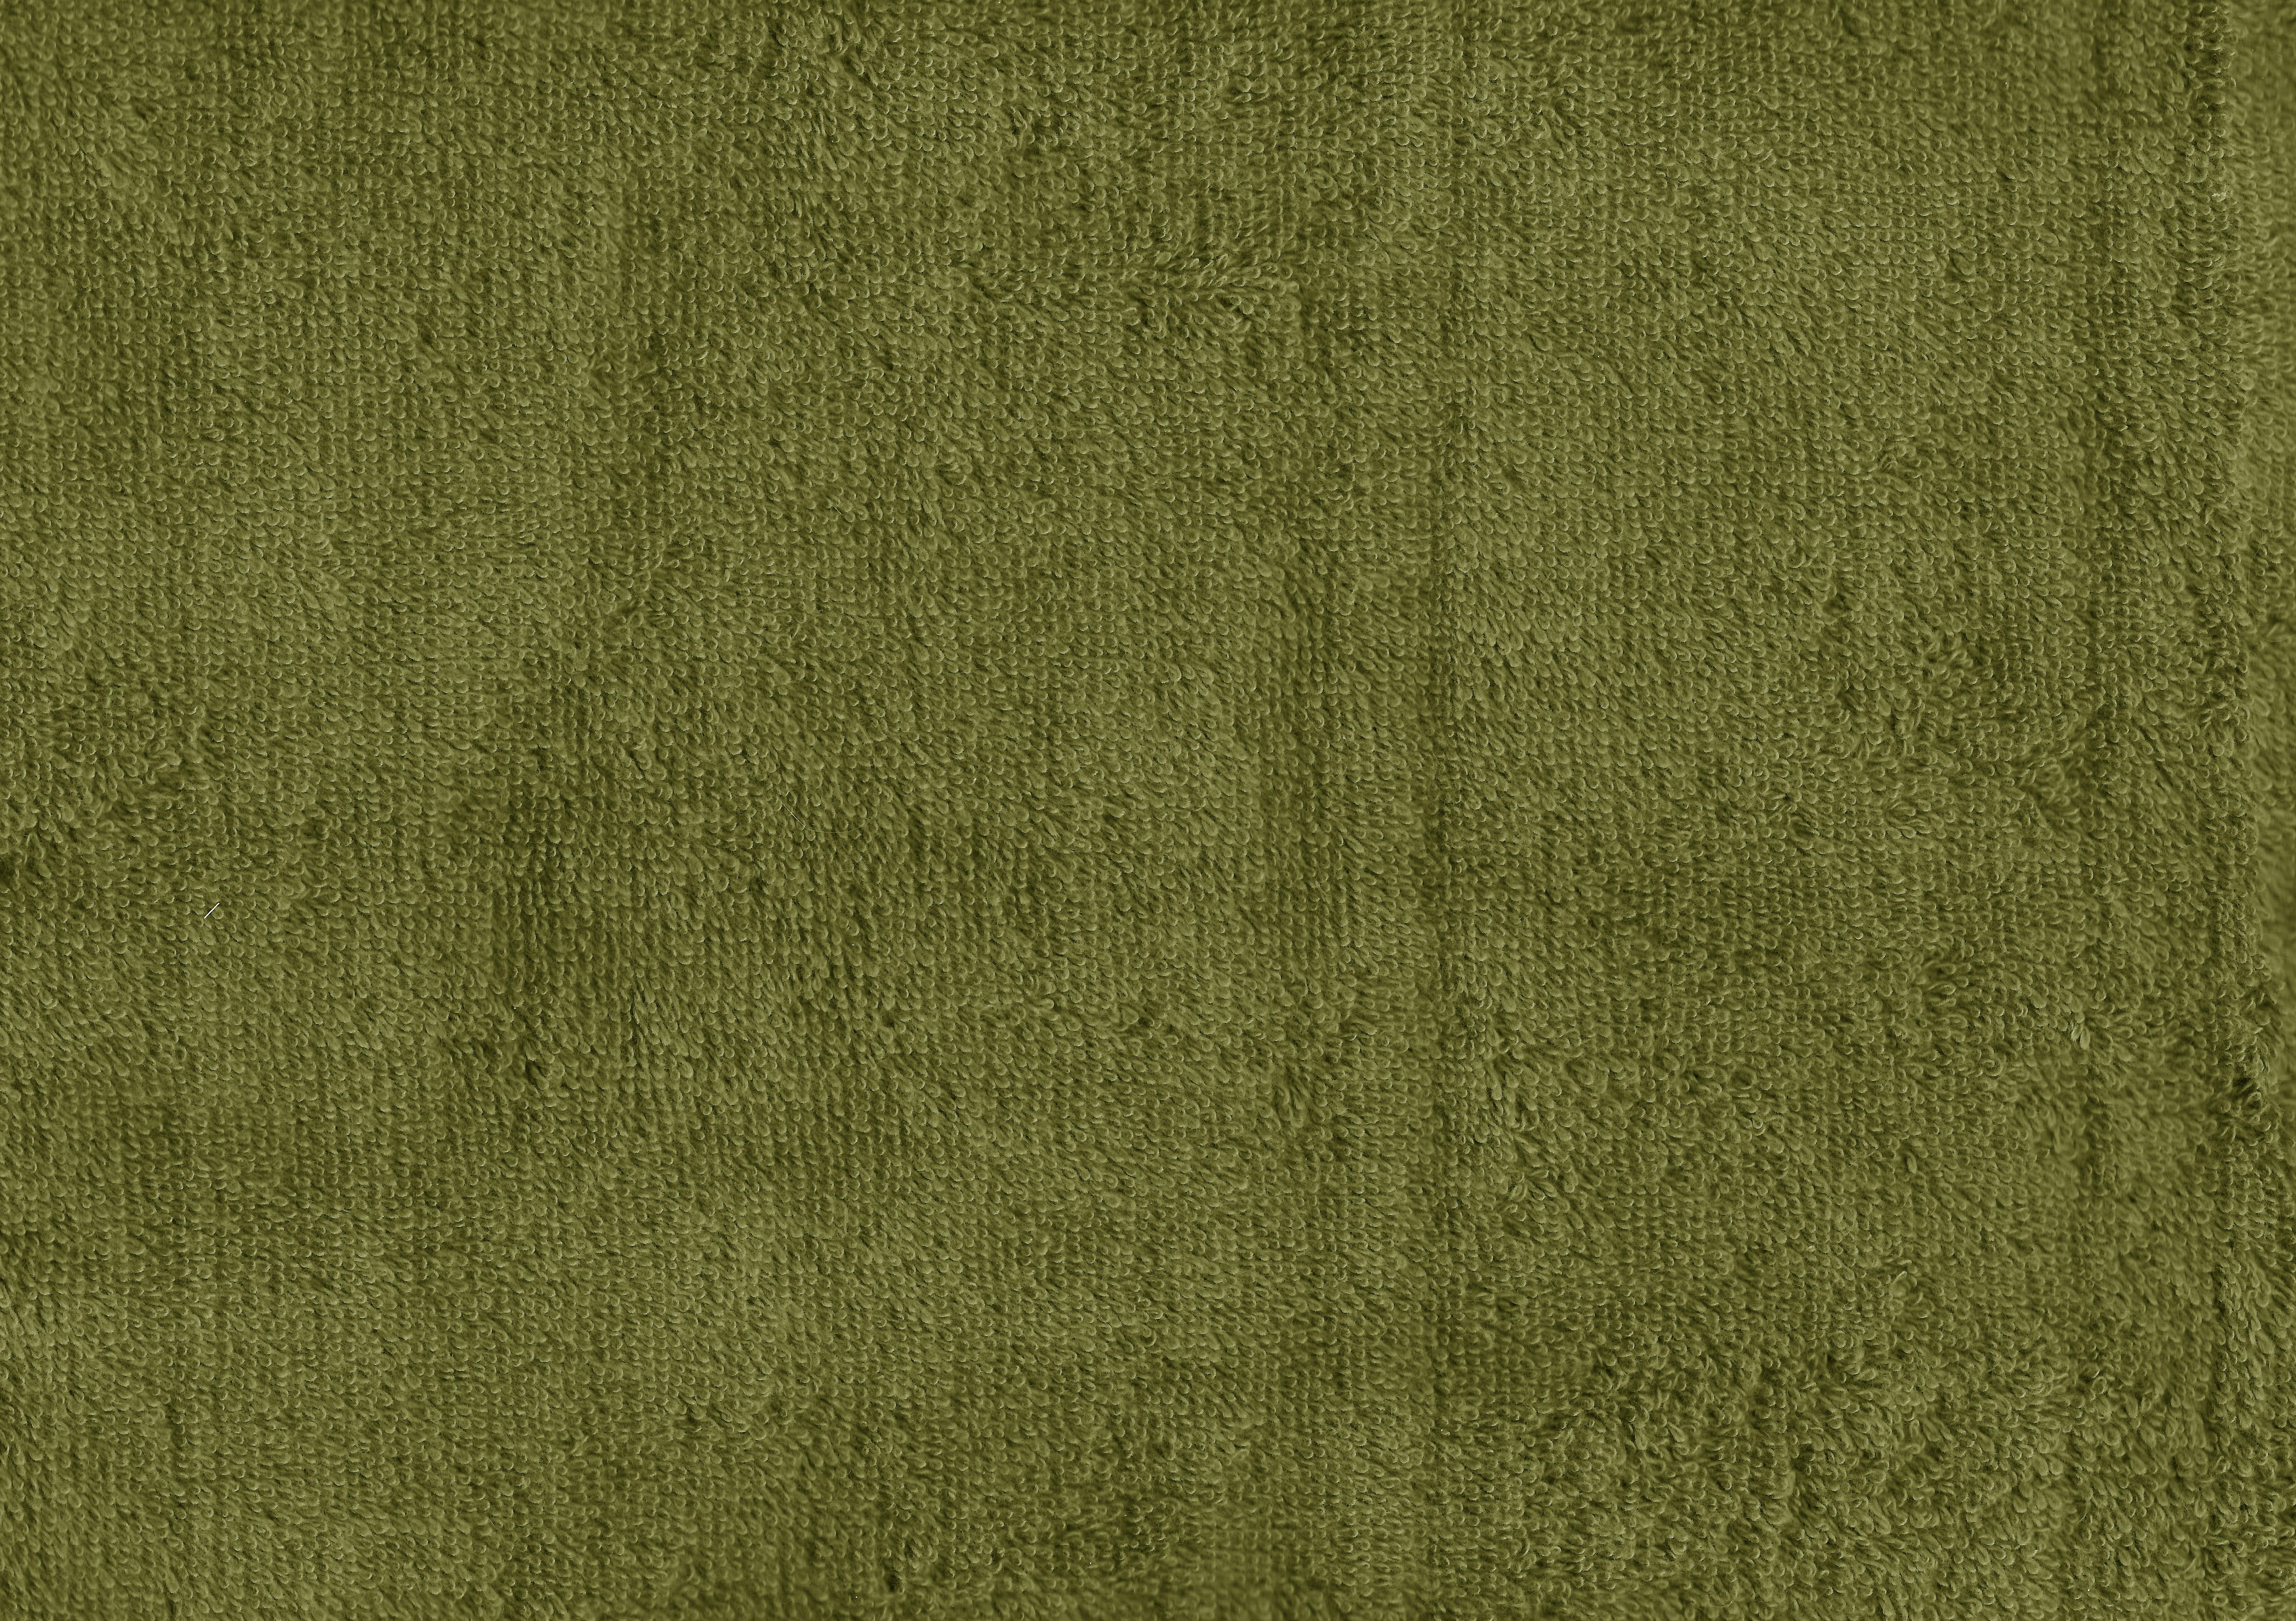 U.S. Air Force OLIVE GREEN FS-34259 2 oz.-tcp1221-2